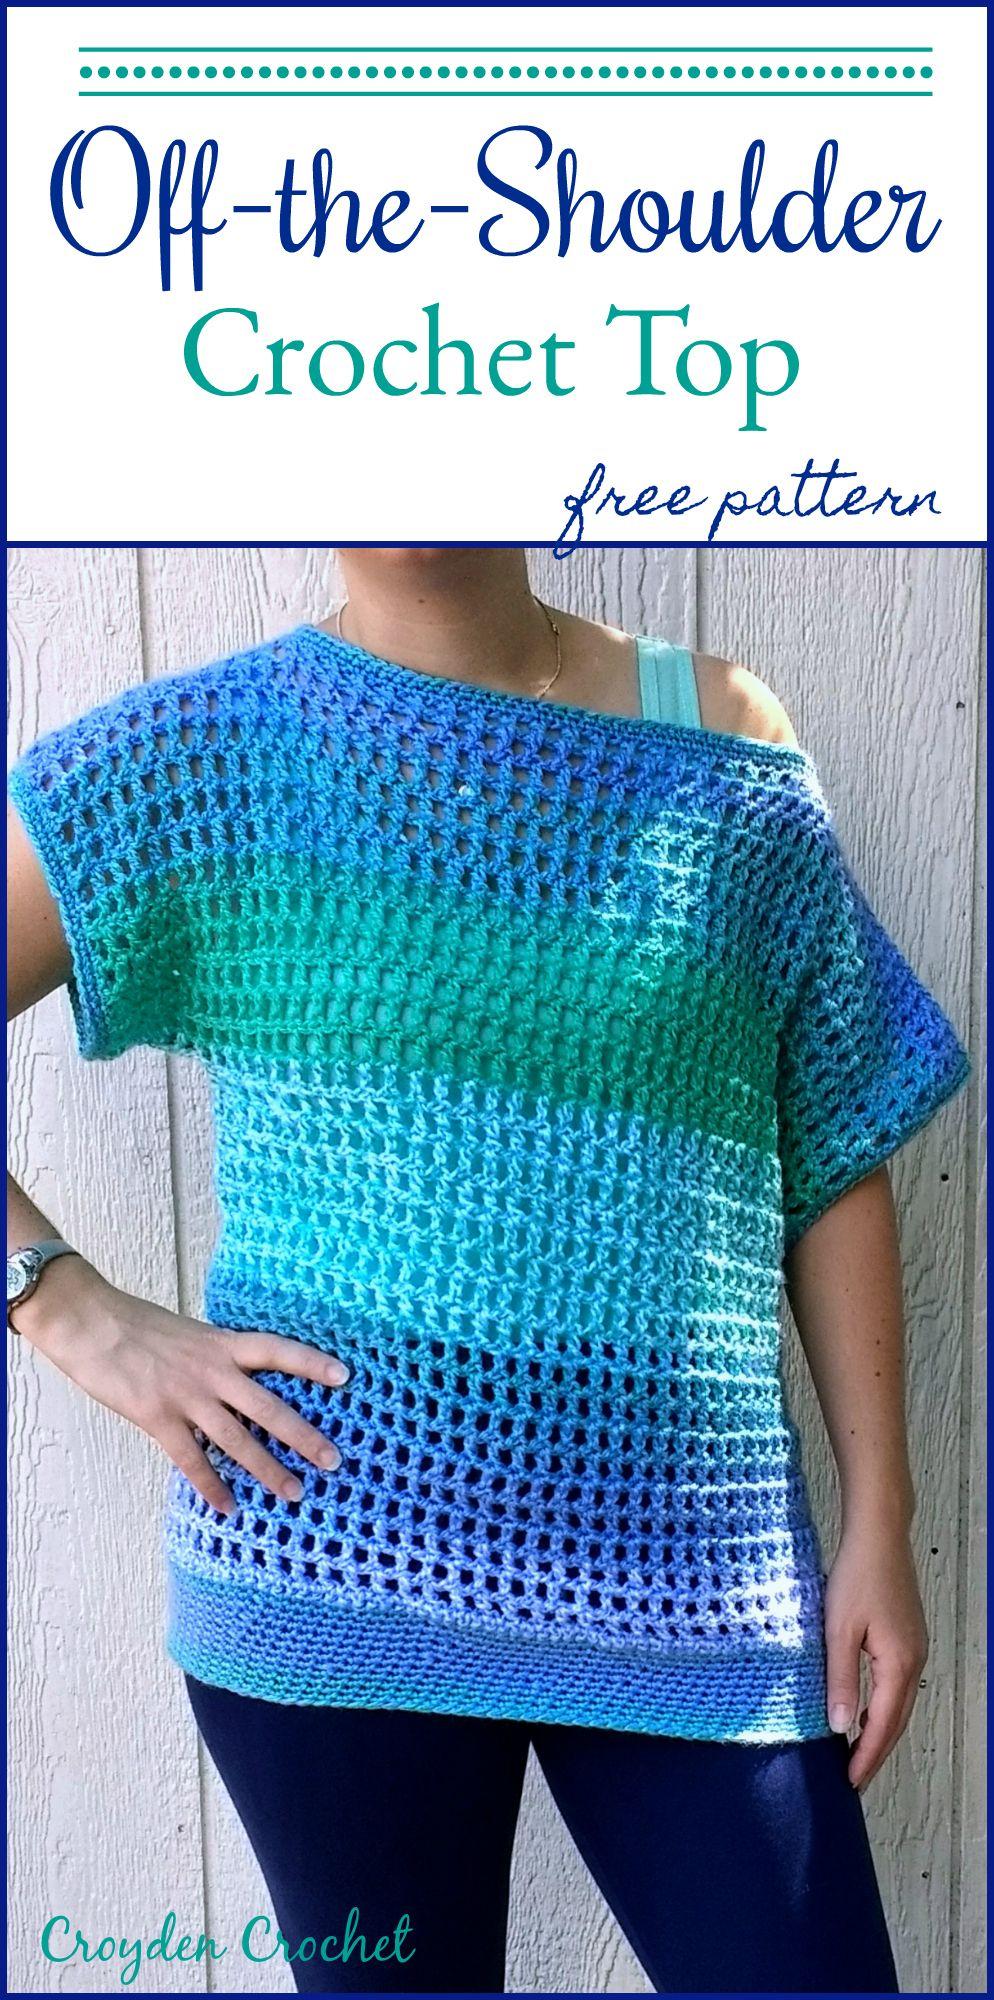 Off The Shoulder Crochet Top Free Pattern By Croyden Crochet